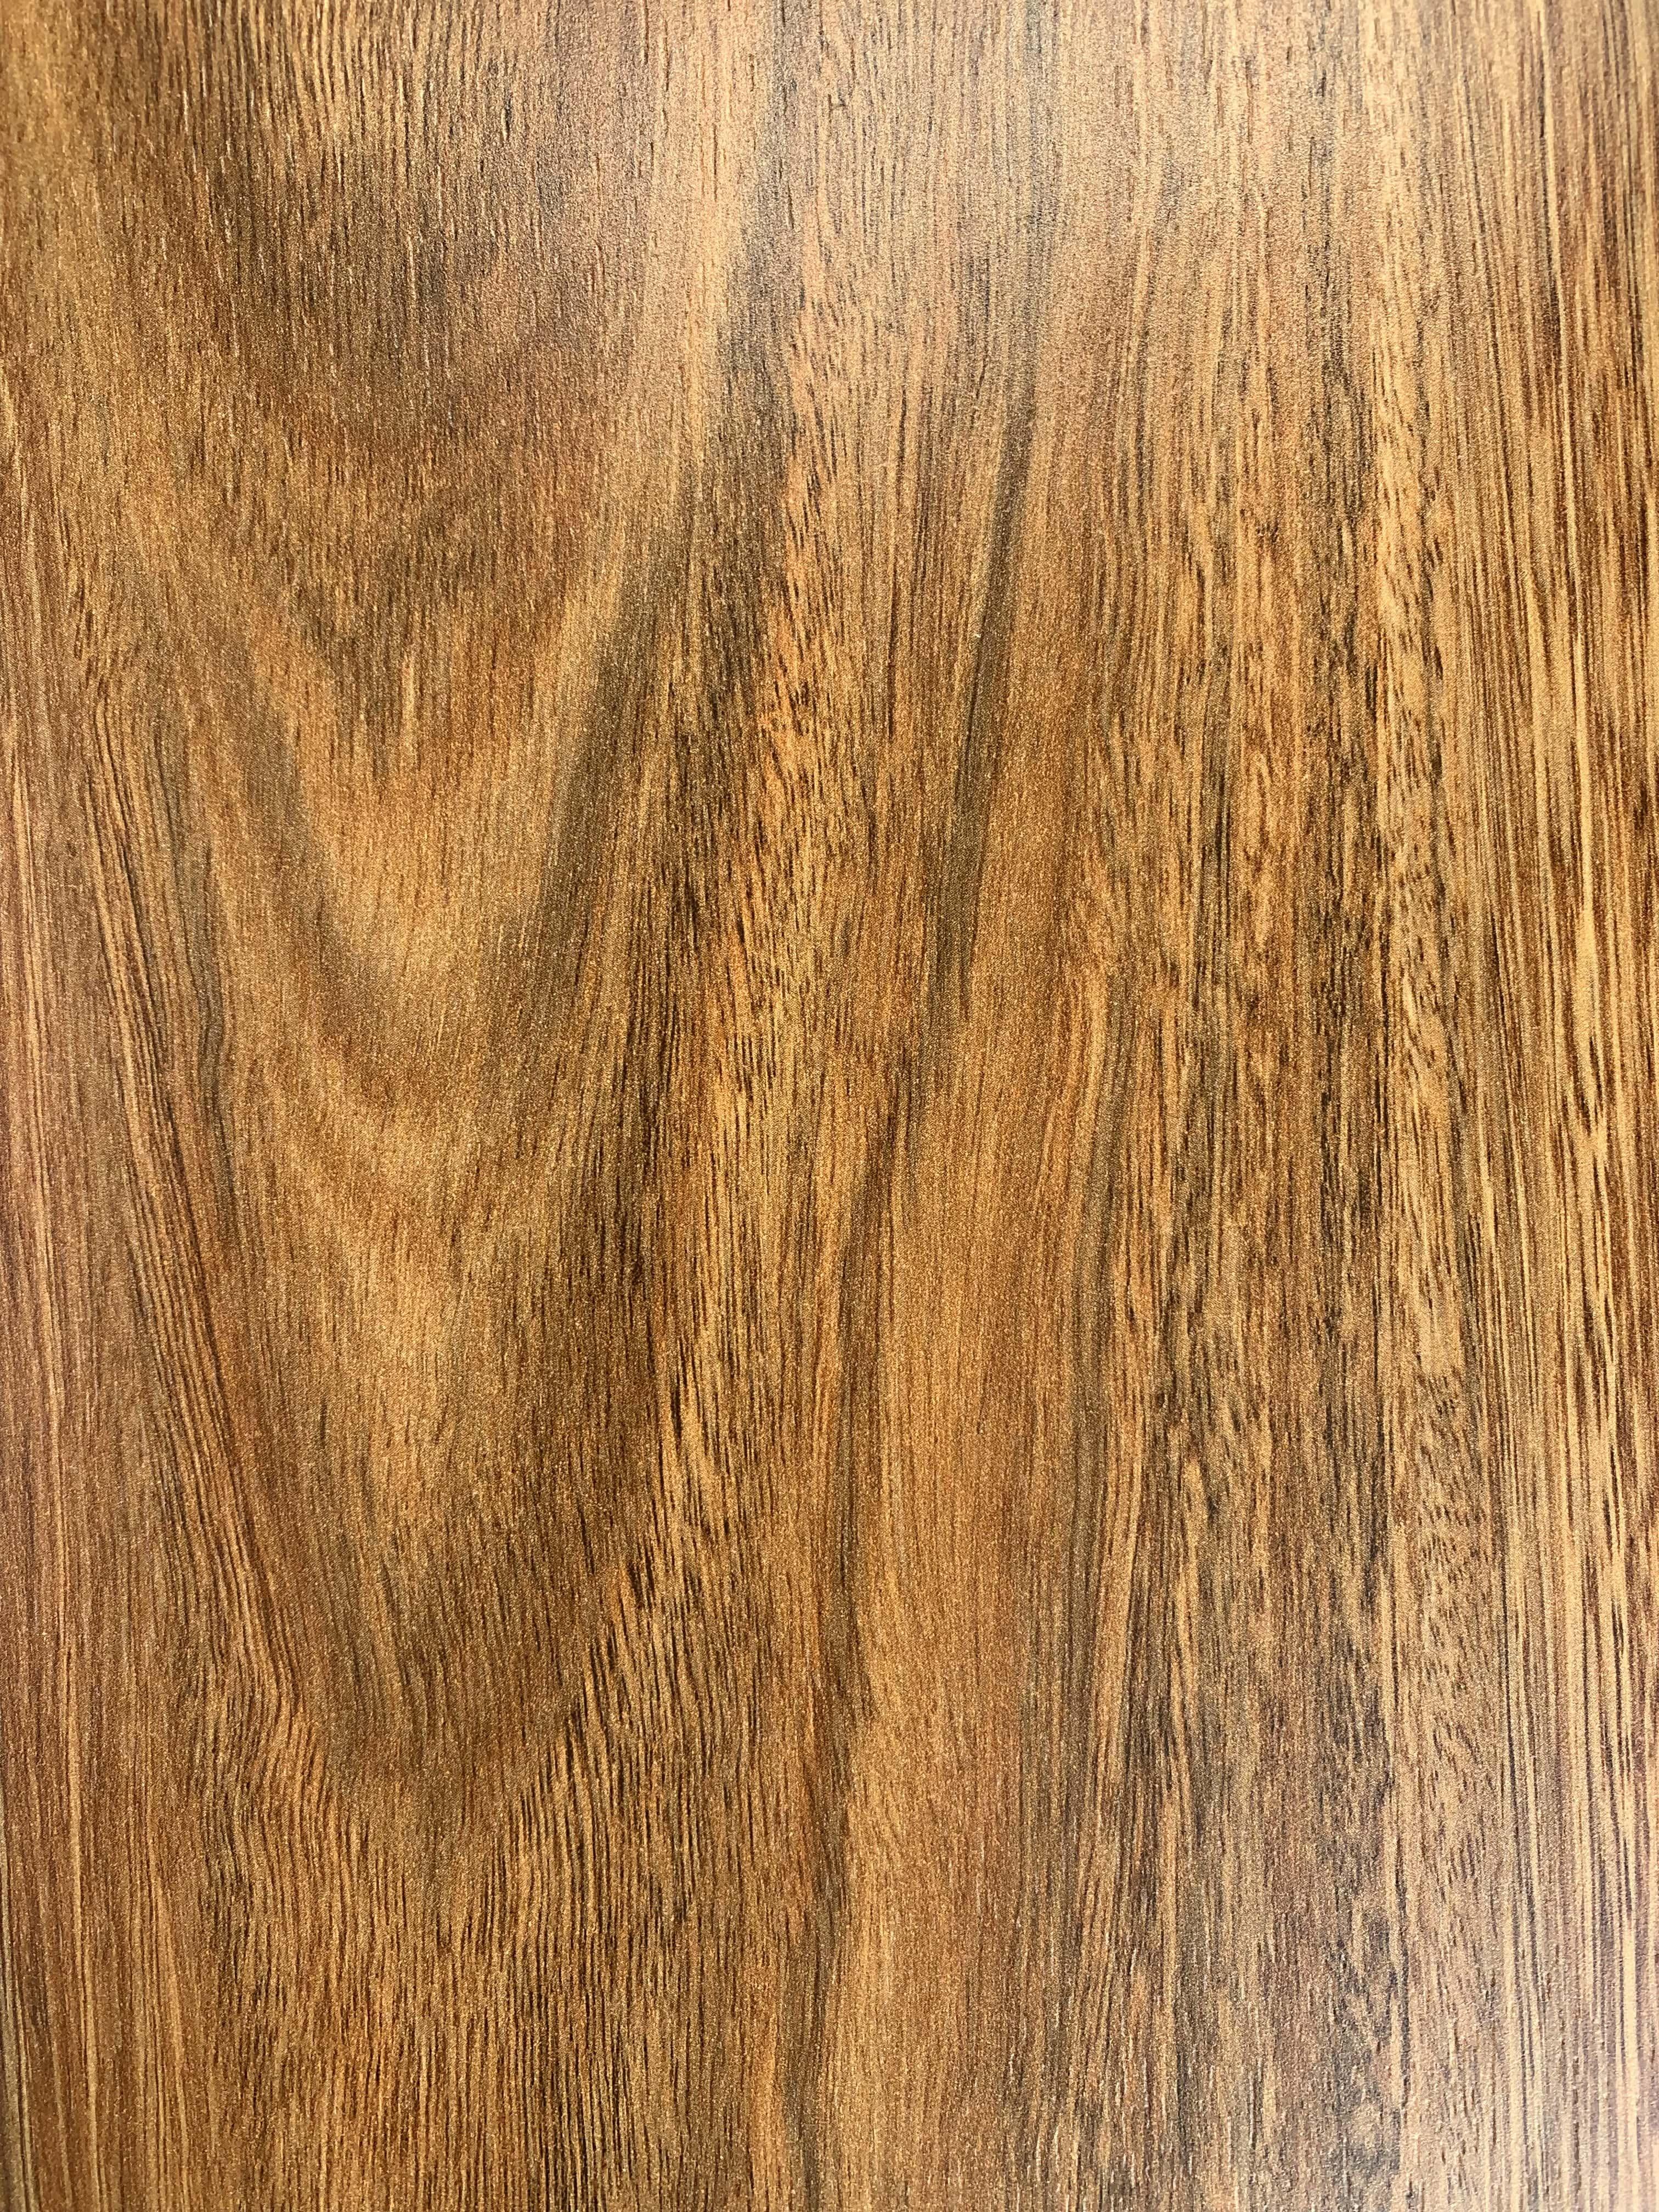 Spotted gum matt Laminate Flooring 1215x195x12mm